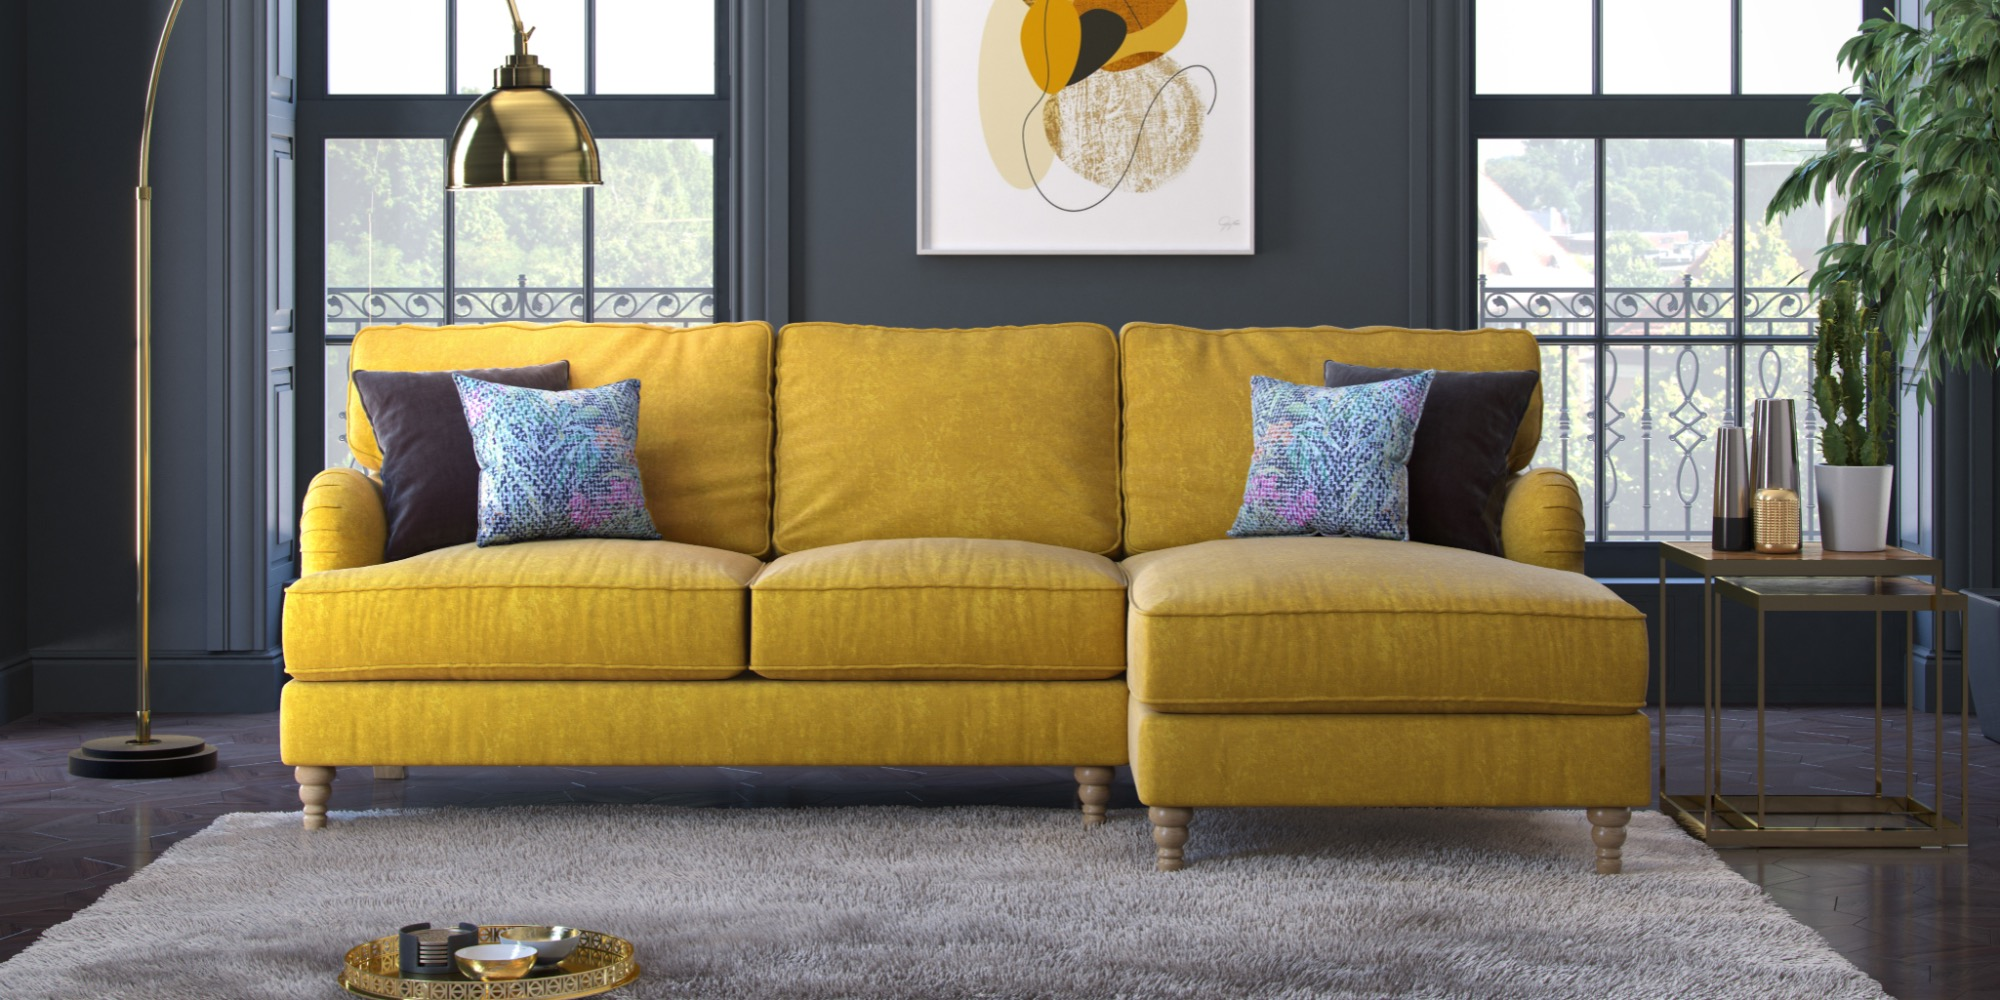 Buoyant Upholstery - Beatriz